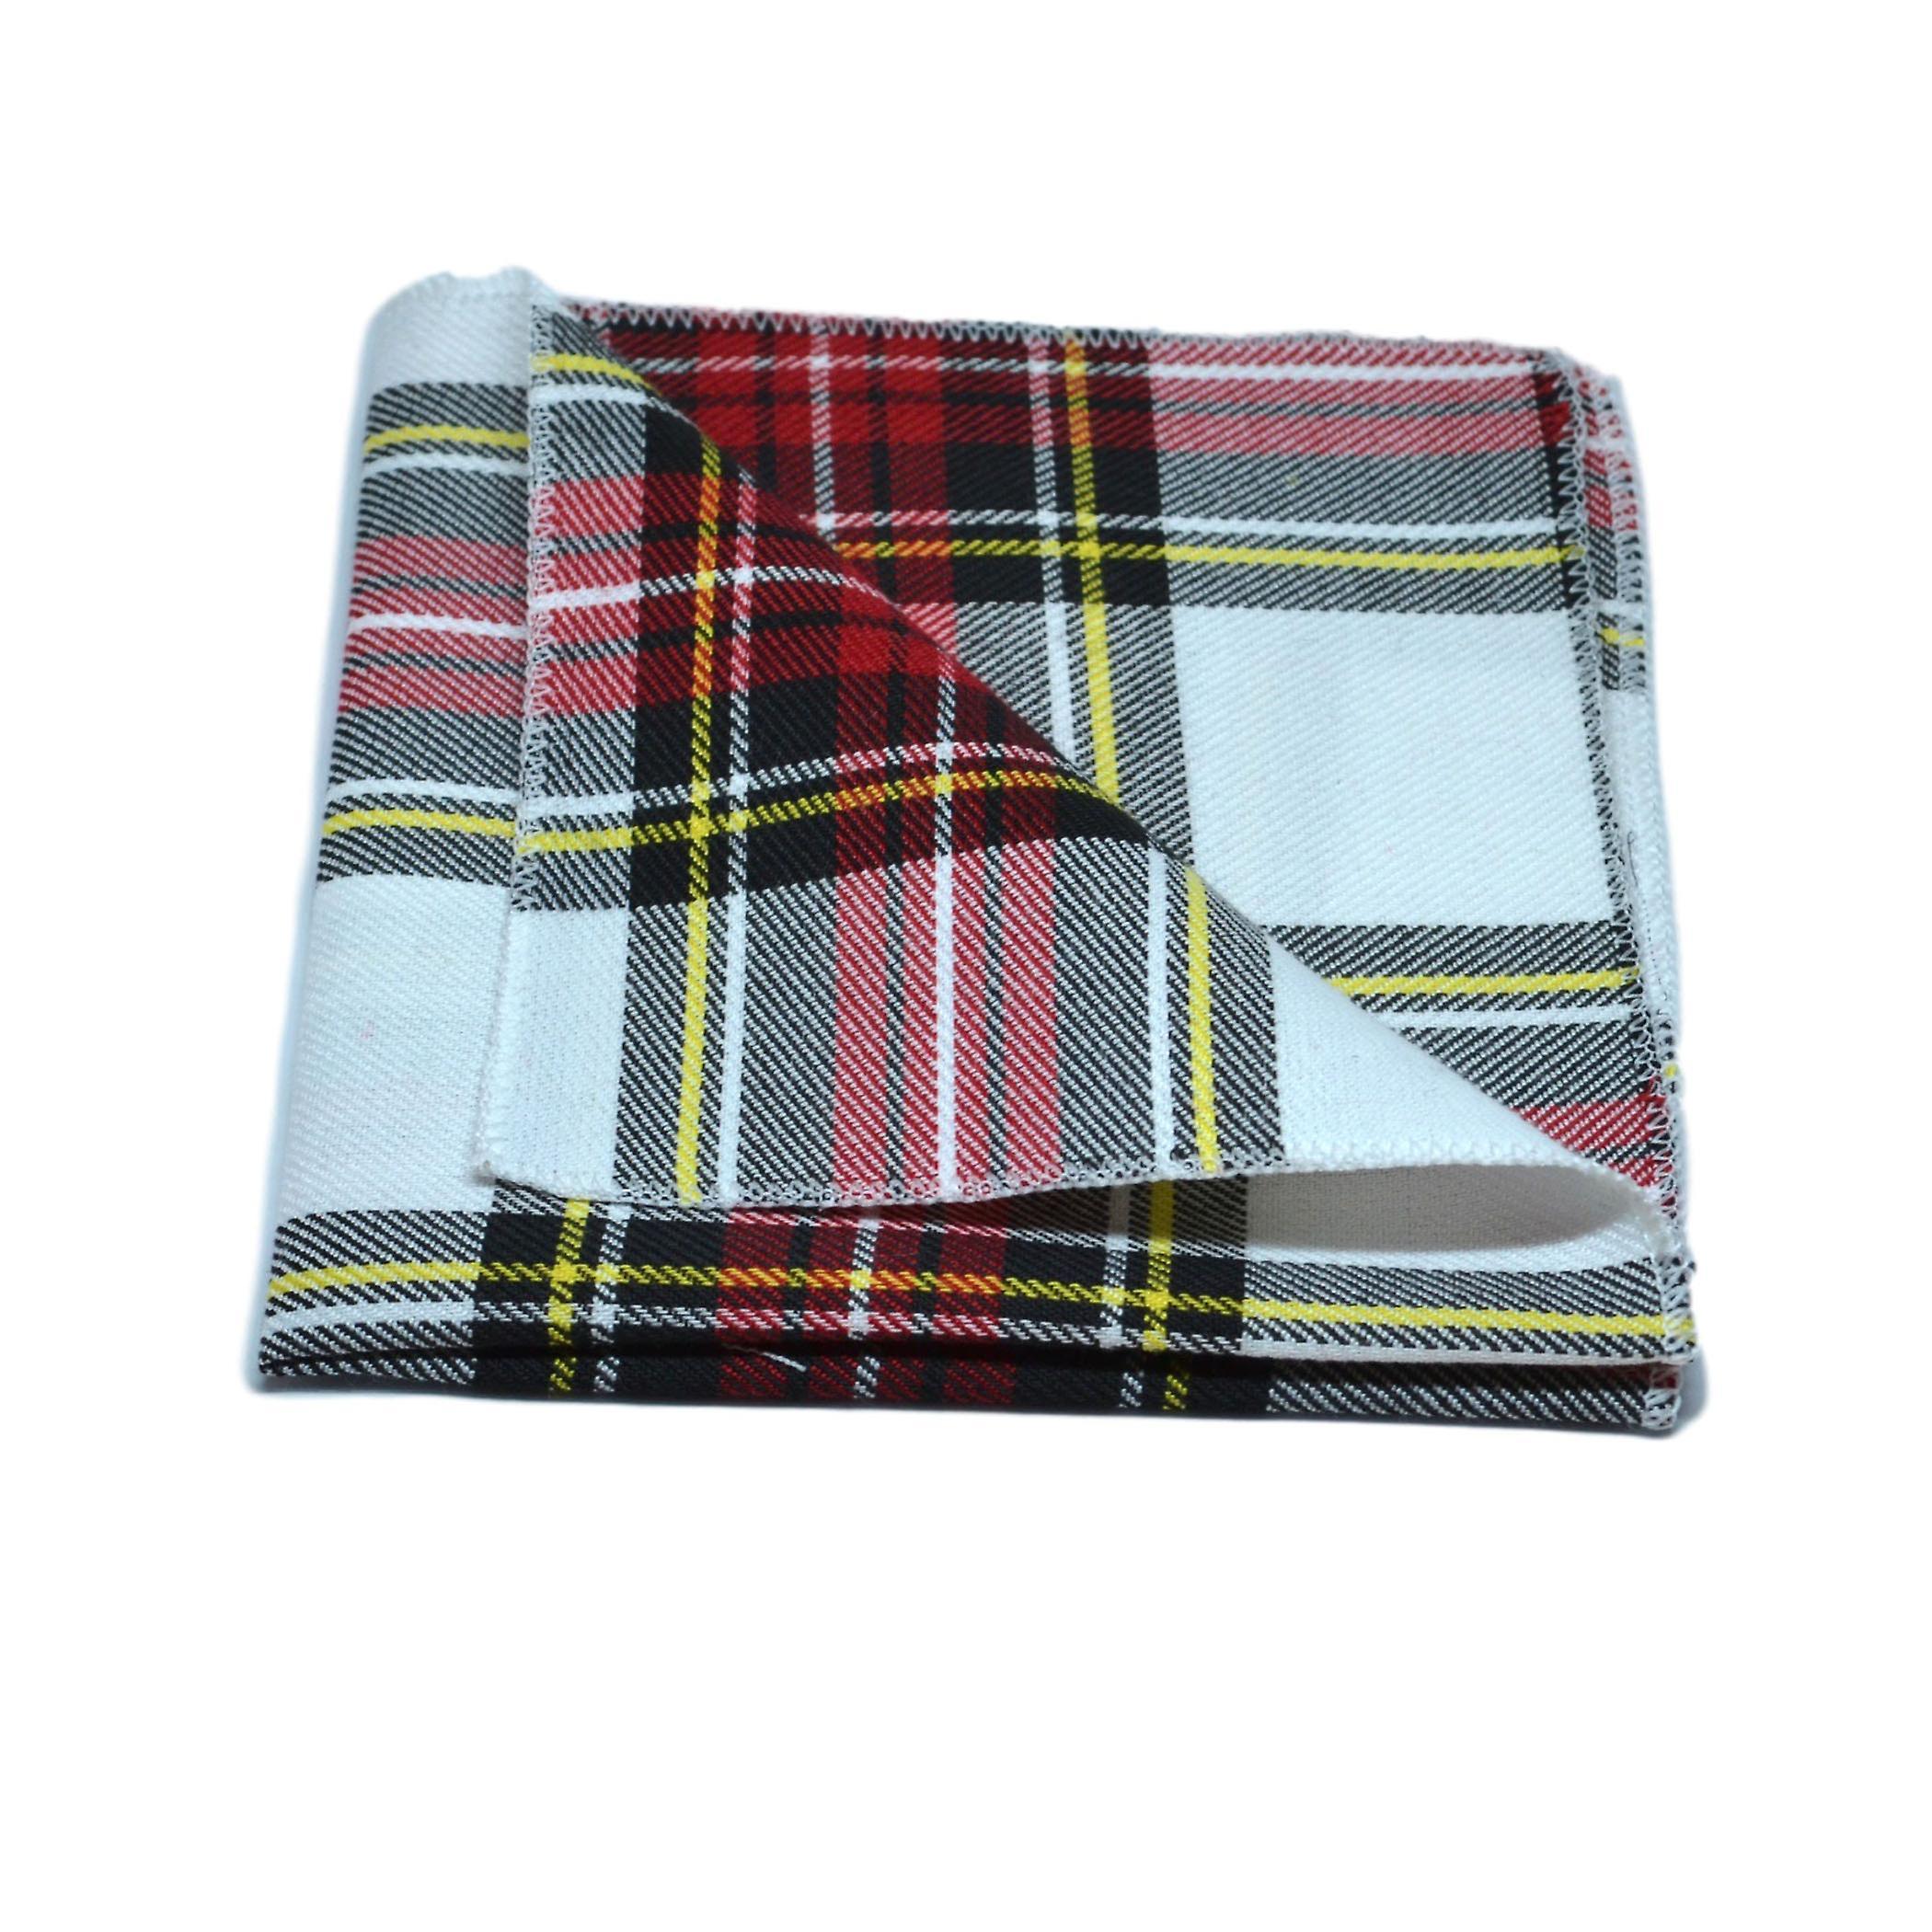 Traditional White & Red Tartan Tie & Pocket Square Set, Check, Plaid